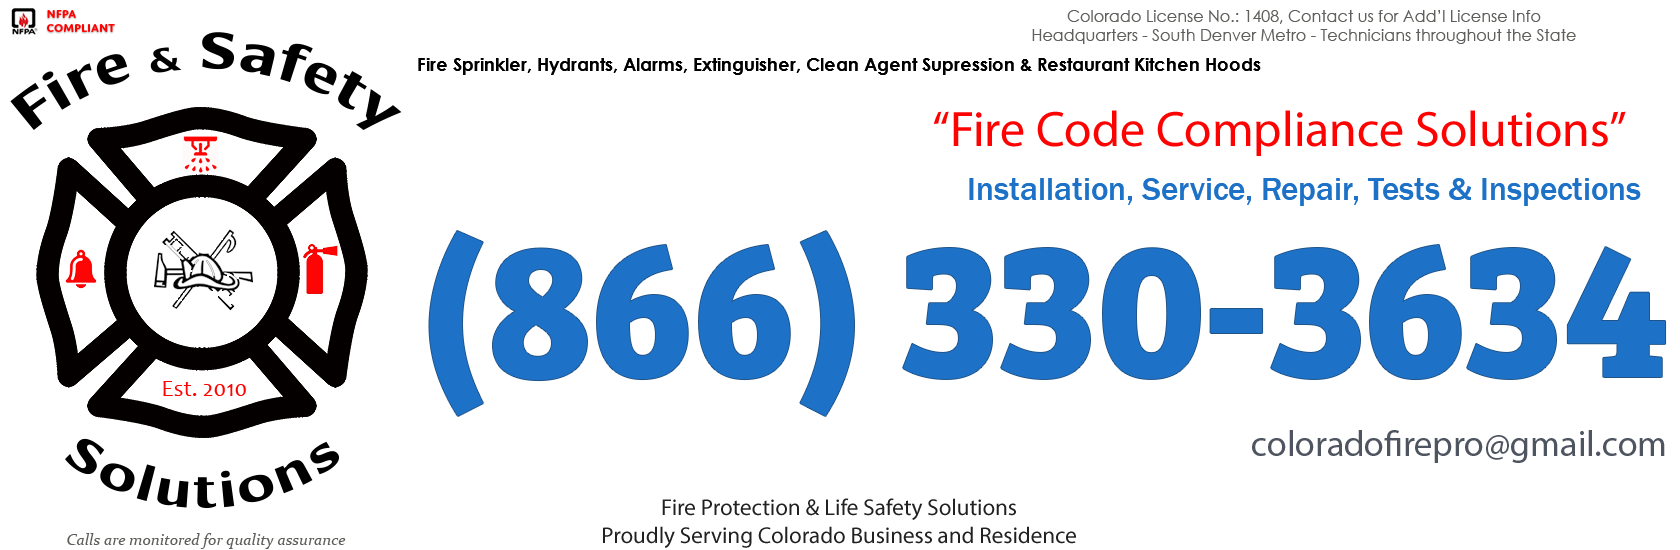 Denver, Colorado Fire Sprinkler Service Company